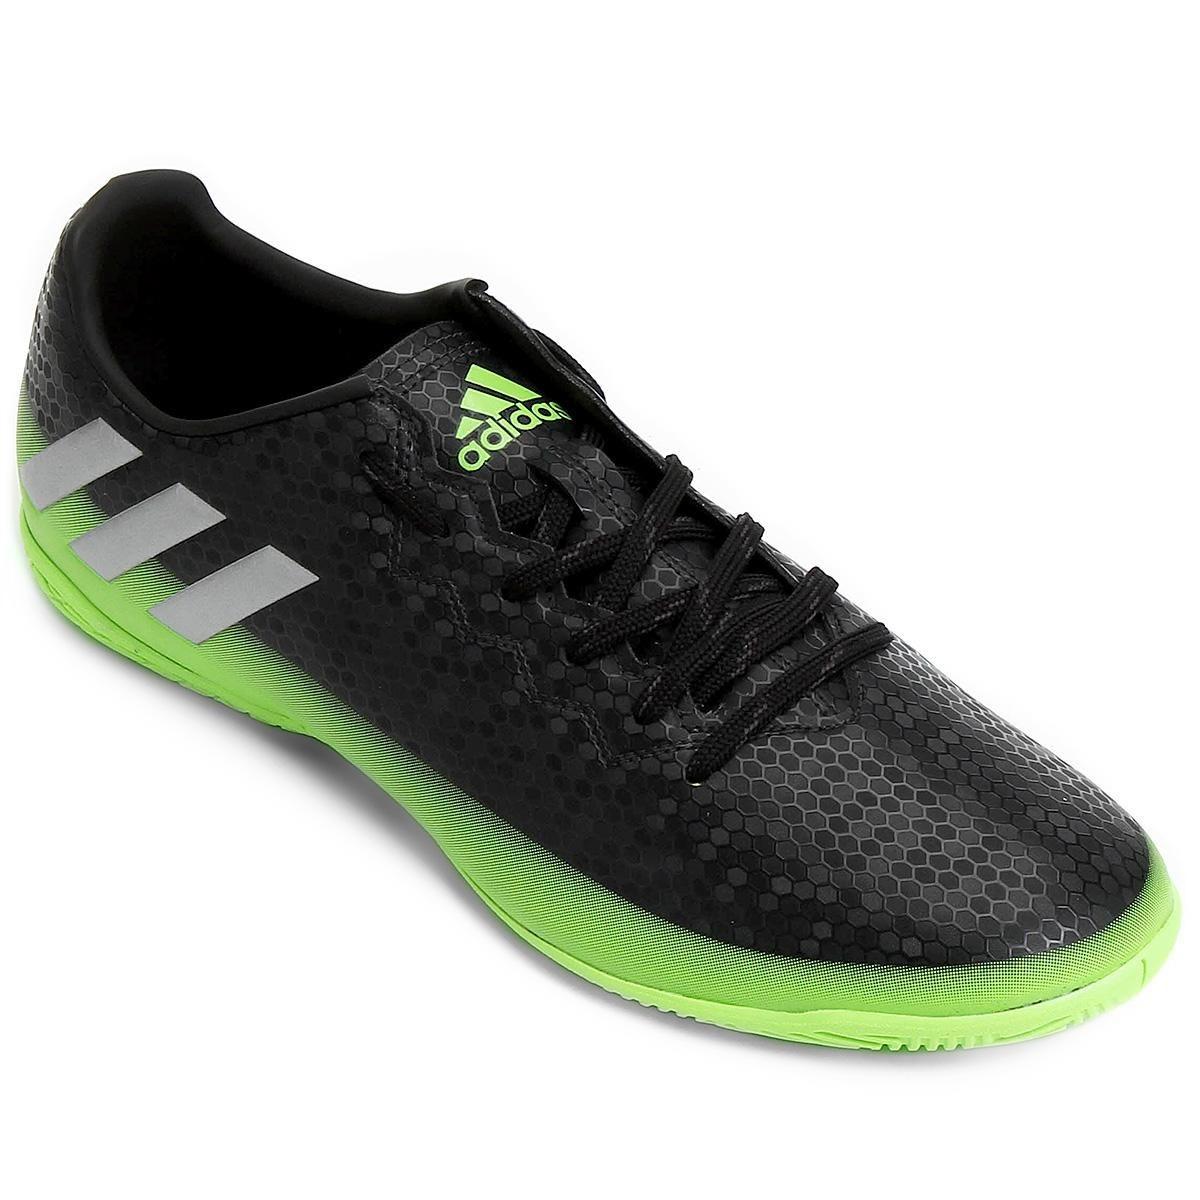 31c56caffc82c Chuteira Futsal adidas Messi 16.4 In - R$ 216,33 em Mercado Livre